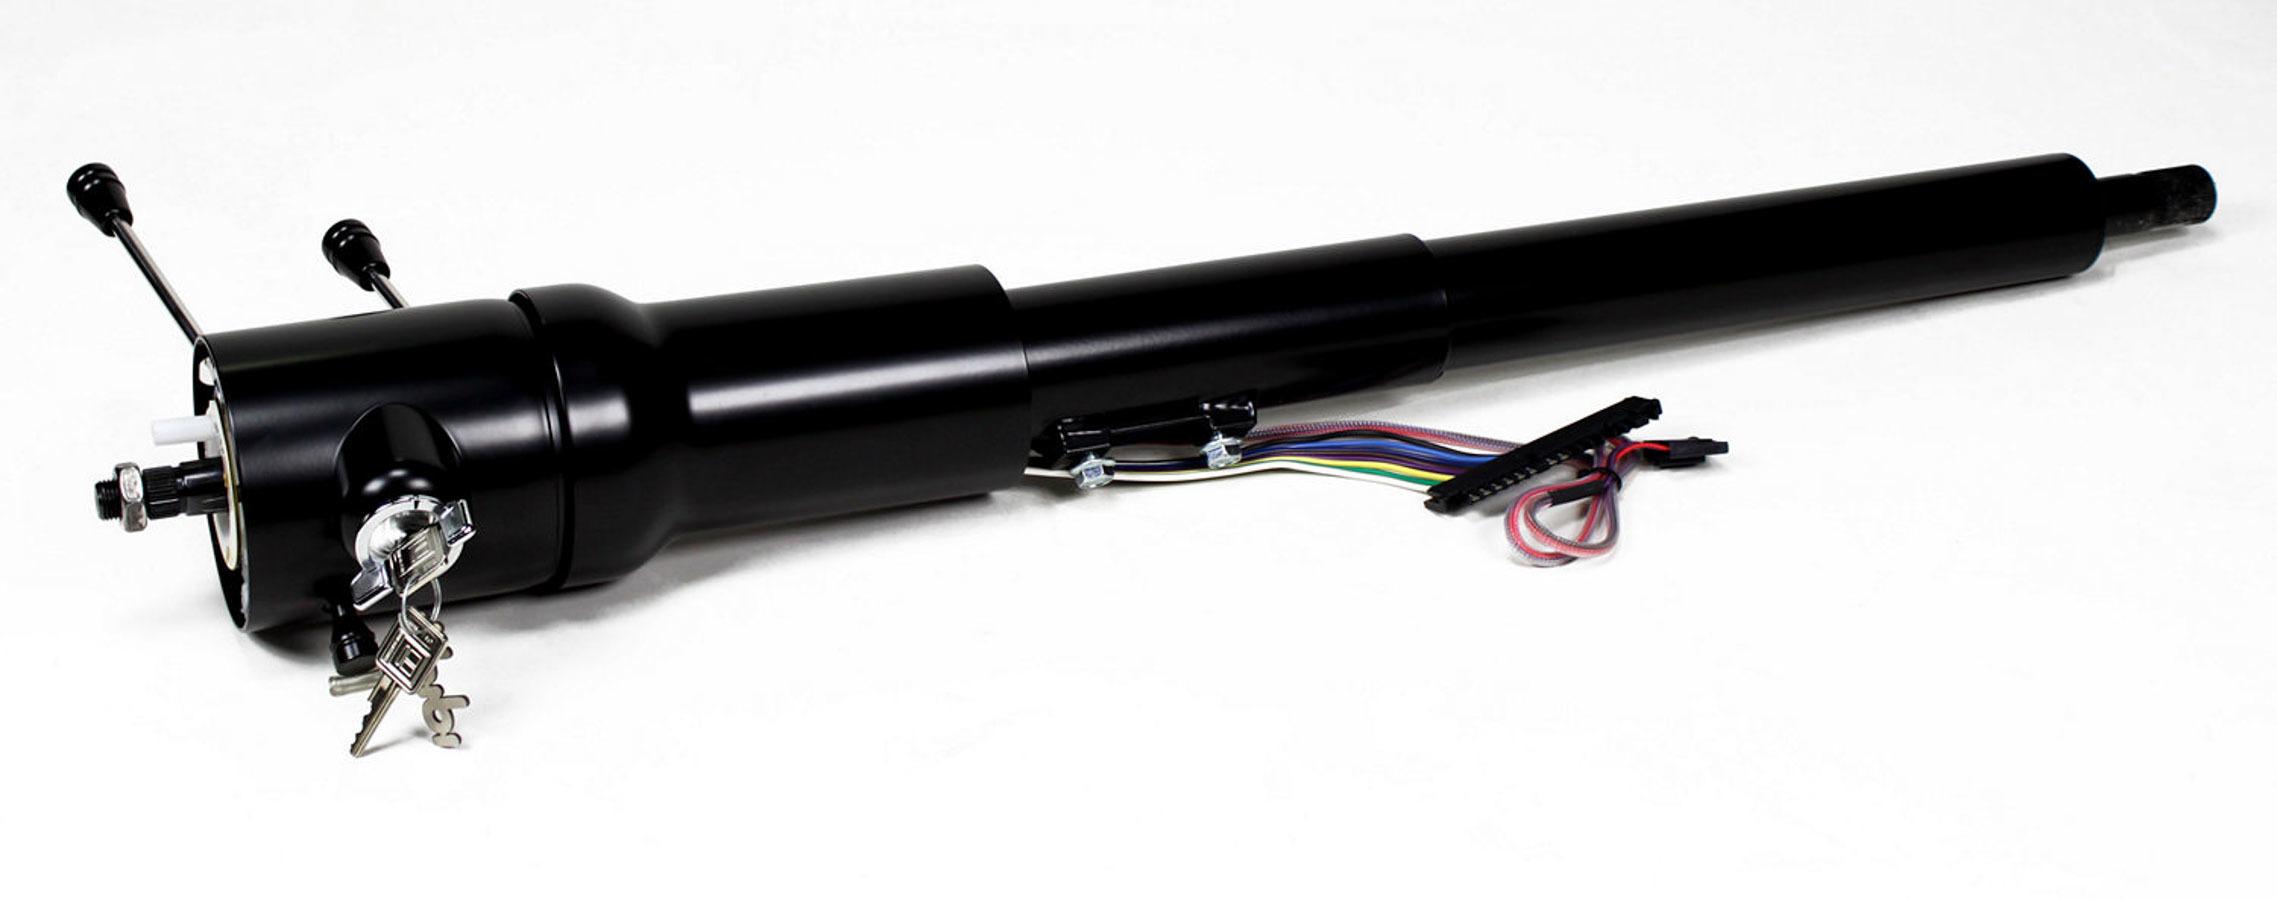 Ididit 1620860051 Steering Column, Retrofit, Tilt, Hazard / Key / Turn Signal, Steel, Black Powder Coat, GM F-Body 1970-75, Each